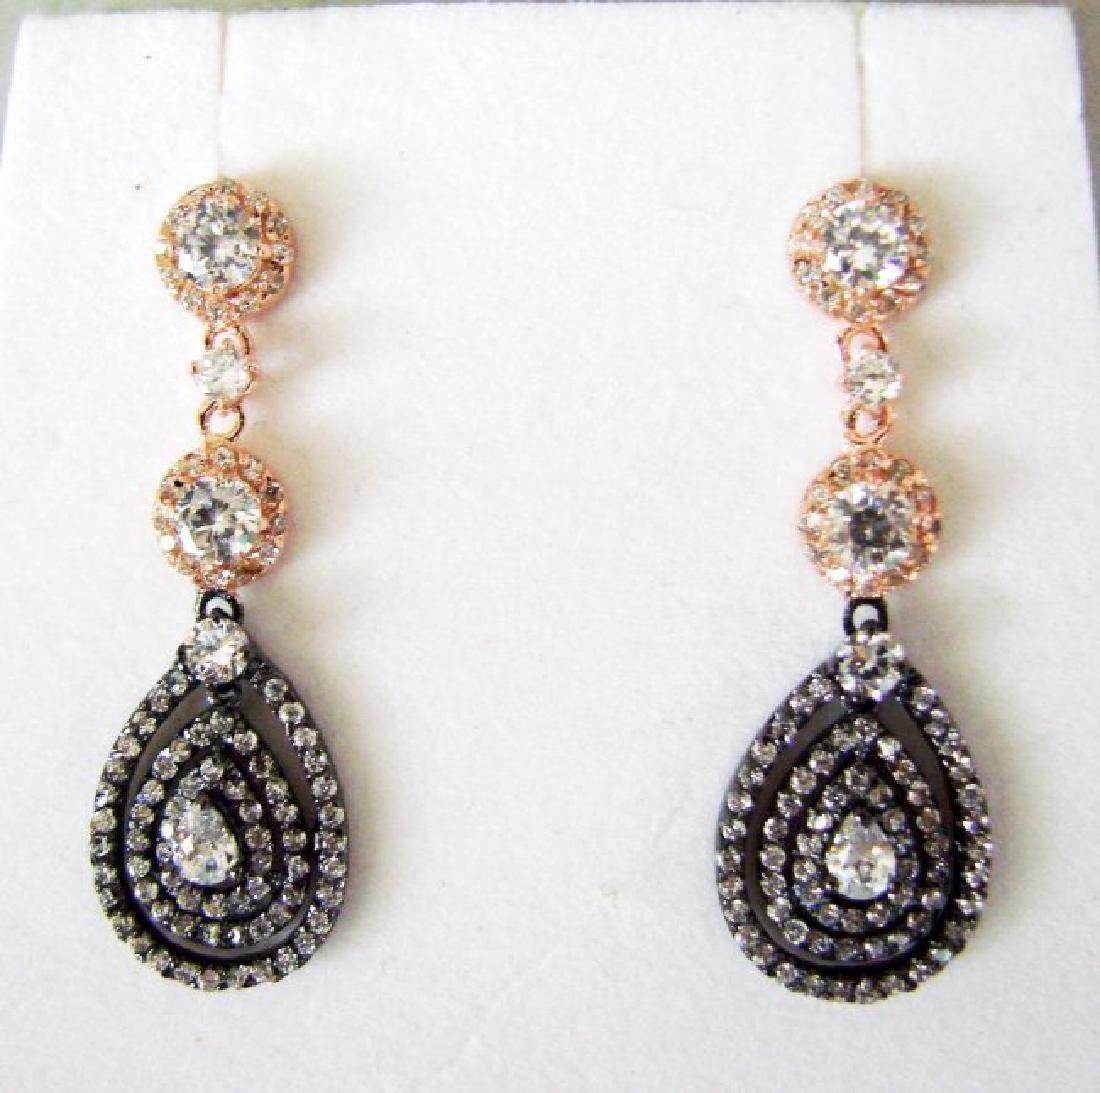 Creation Diamonds Earring 4.48Ct 18k Two Tone Overlay - 2